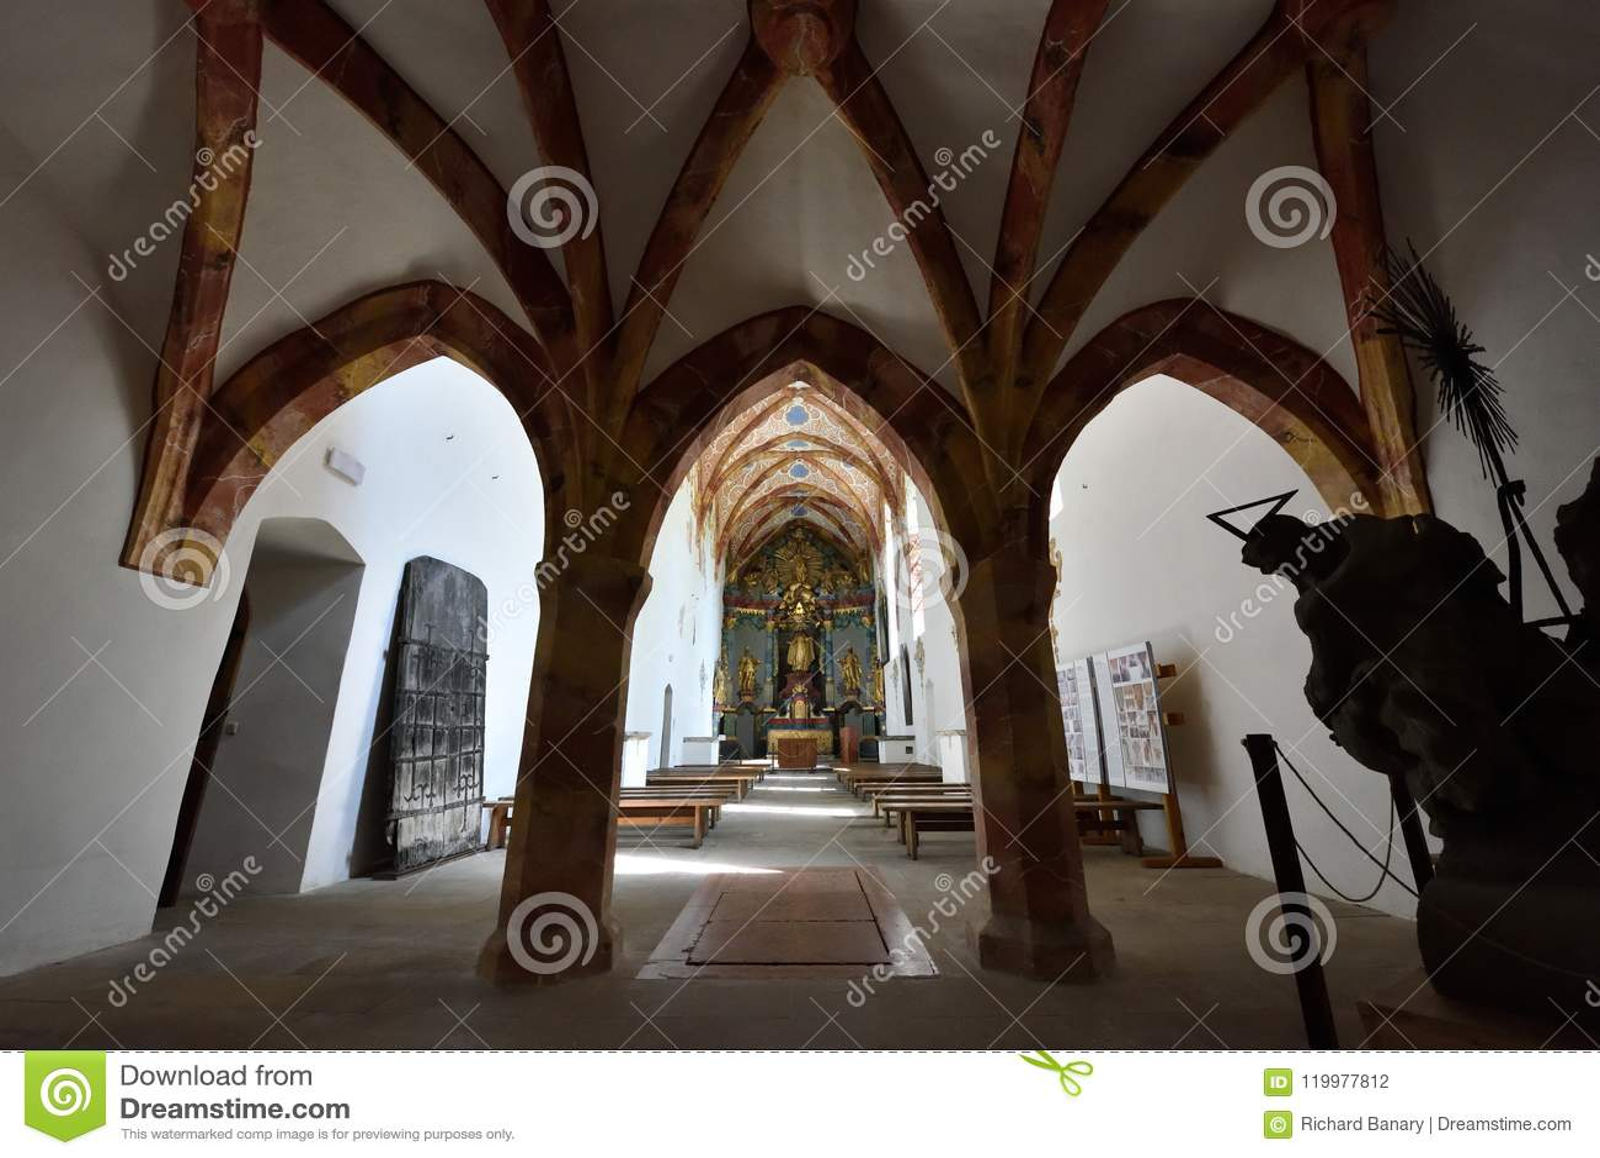 Red Monastery Church, Spis region, Slovakia